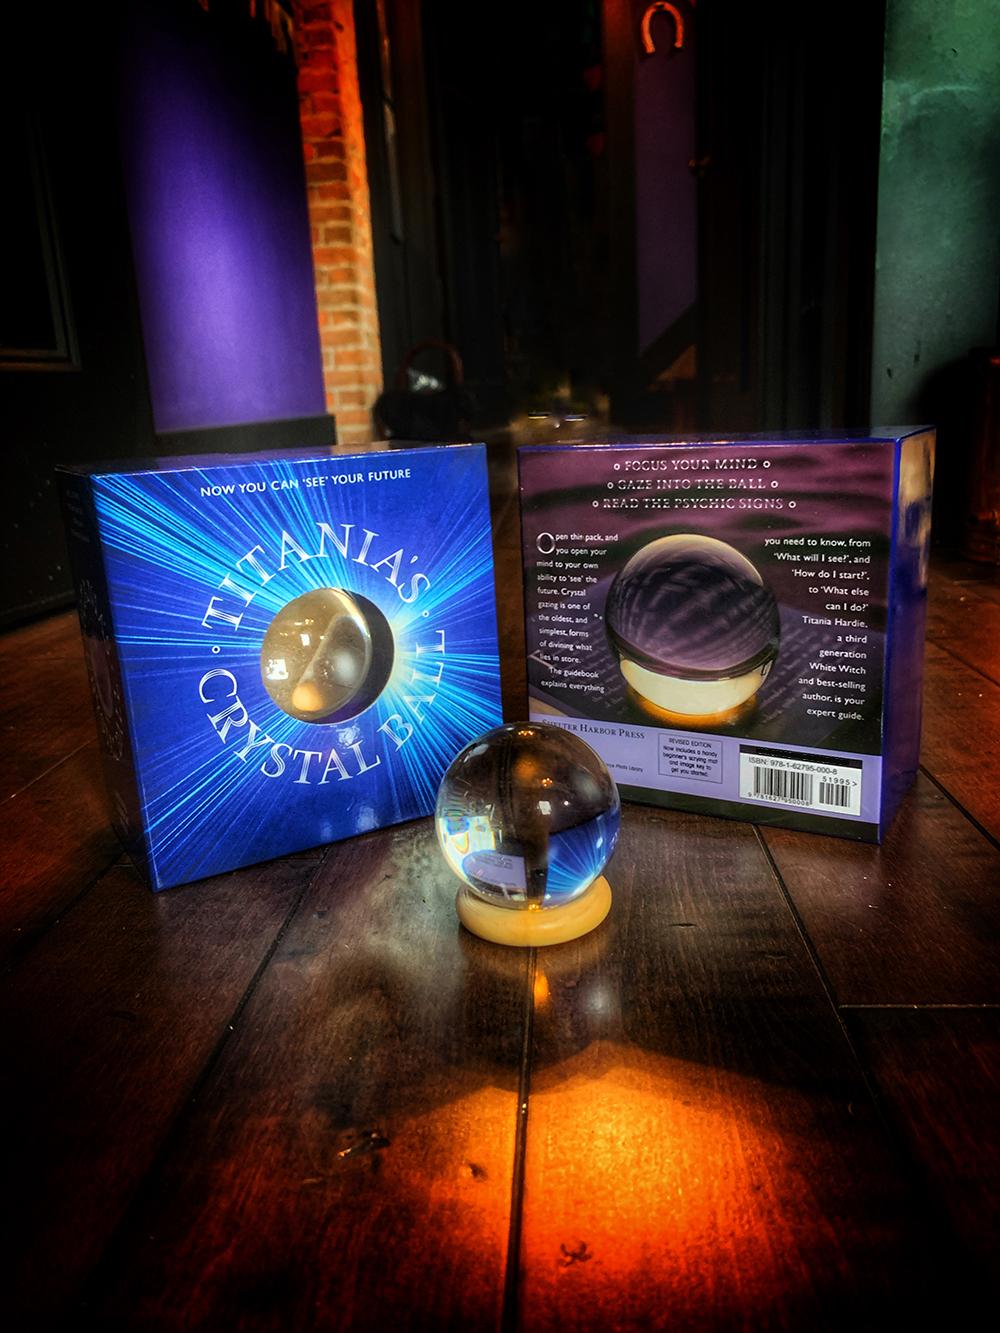 Titania's Crystal Ball